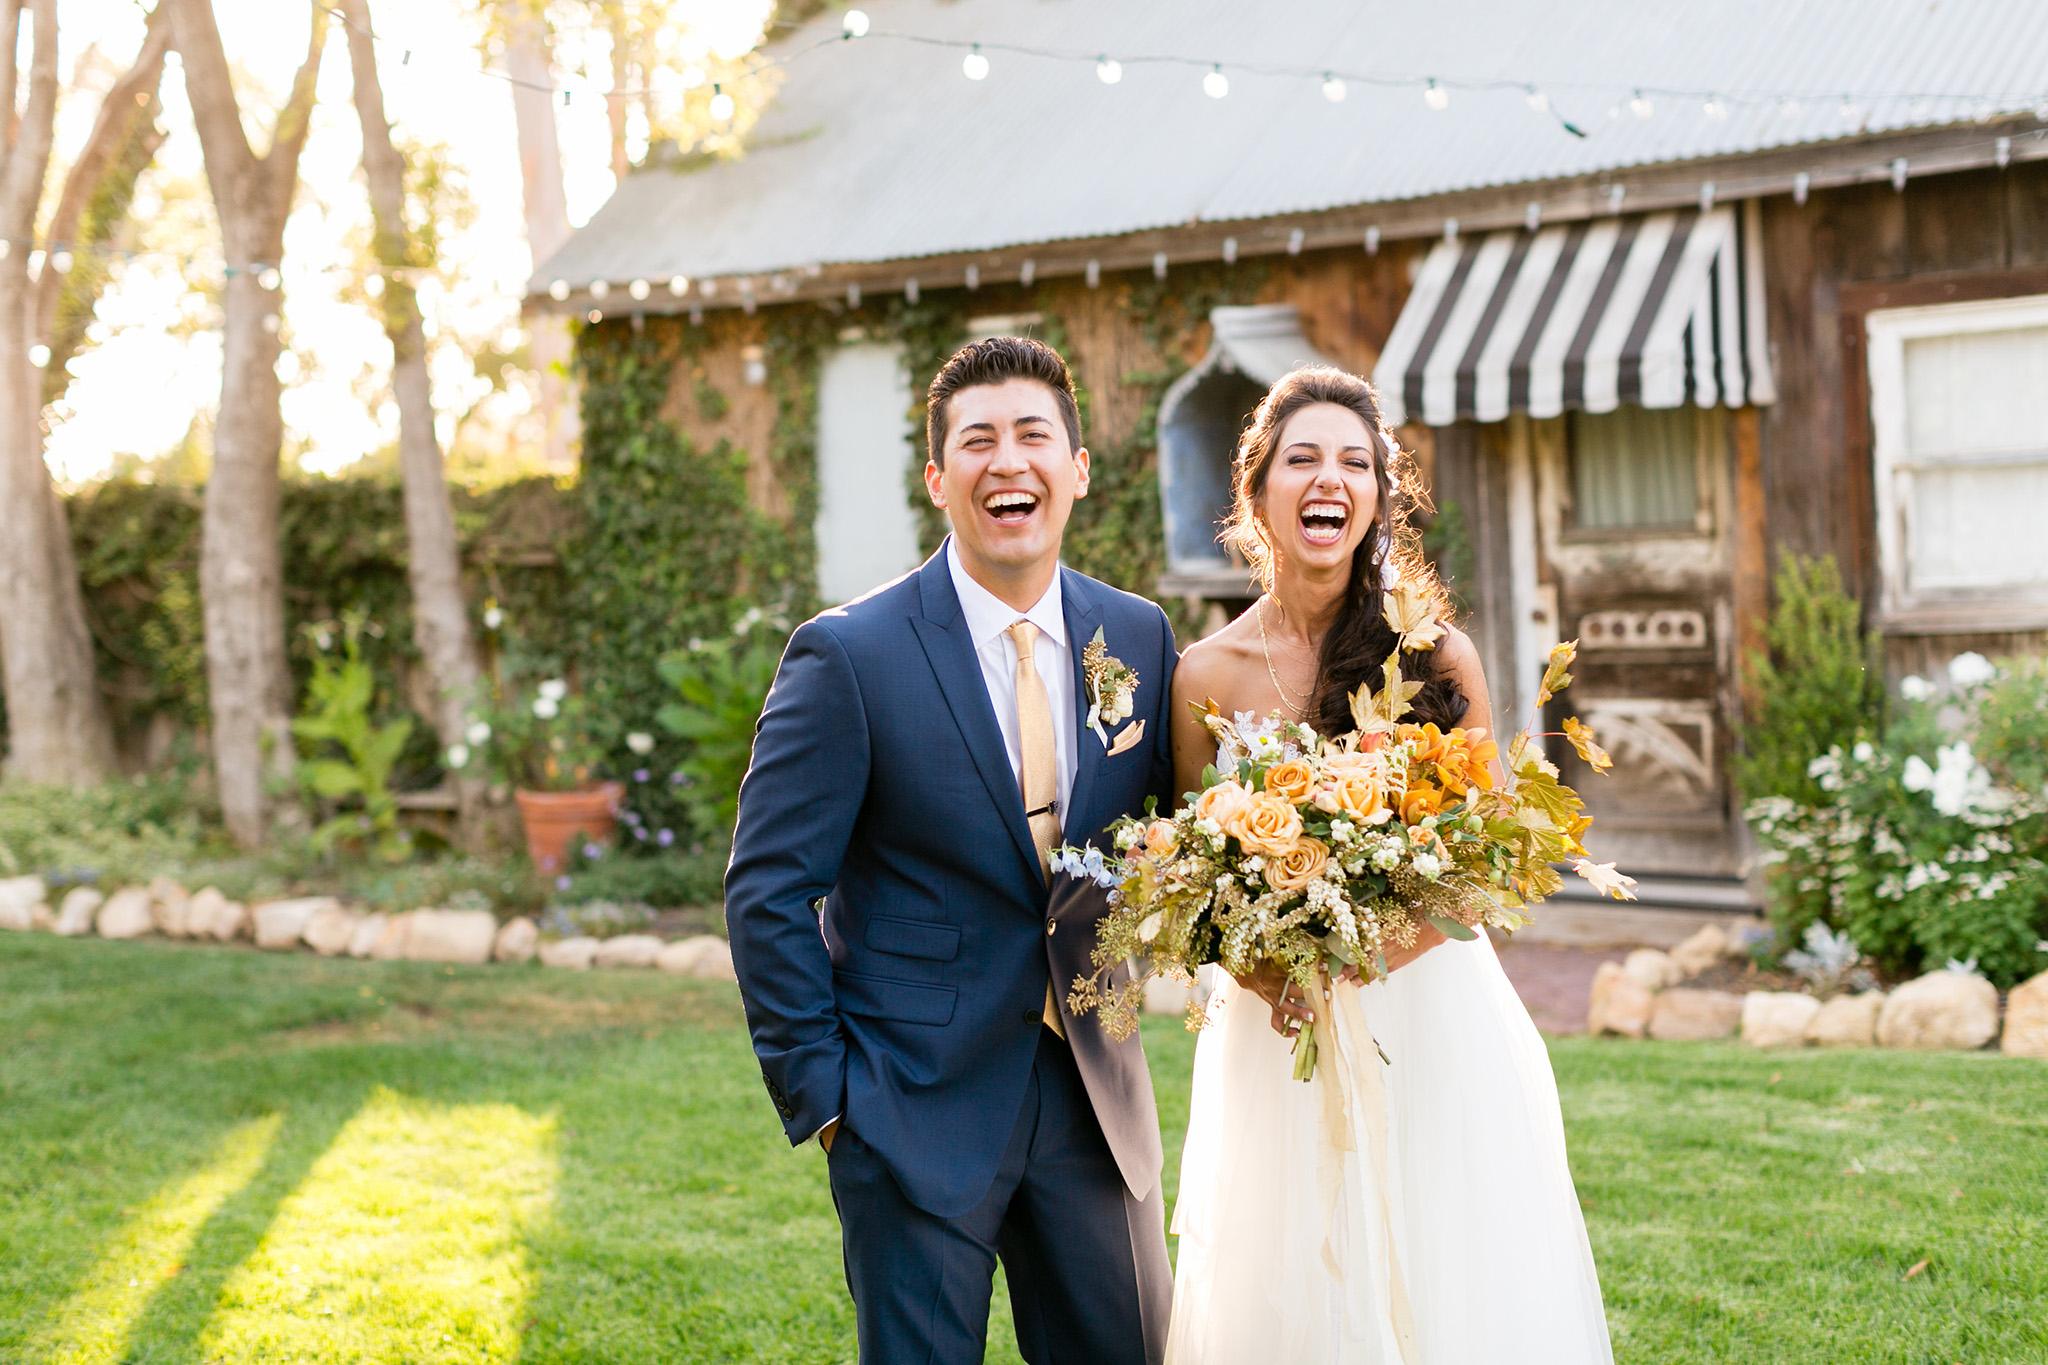 Happy bride and groom at Dana Powers House wedding in Nipomo, CA